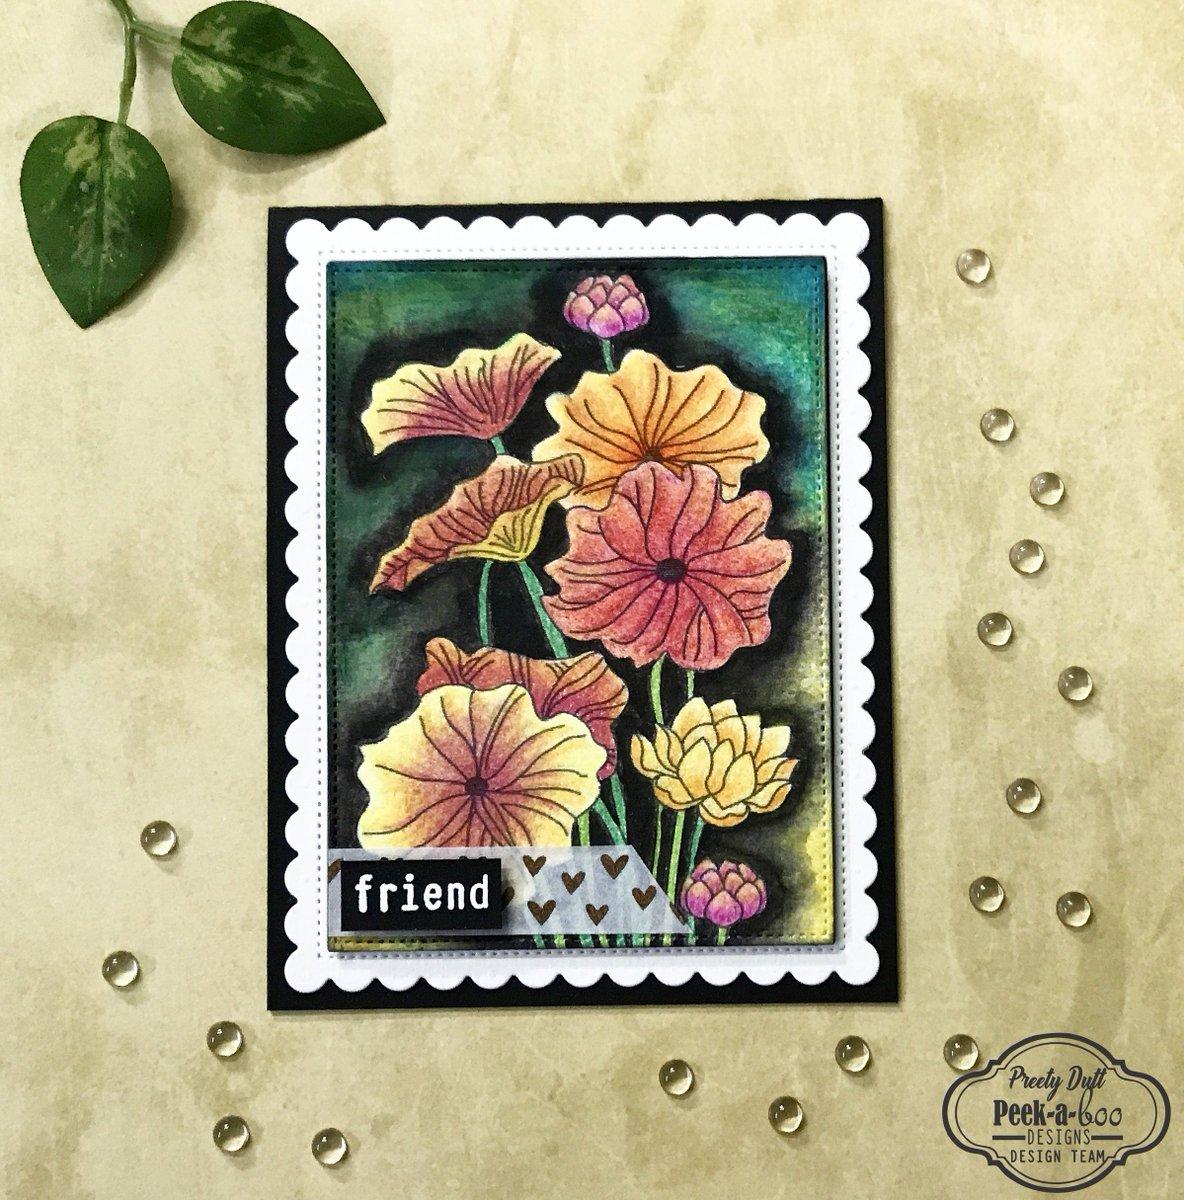 dutt preety on twitter floral friendship card peekaboodesigns